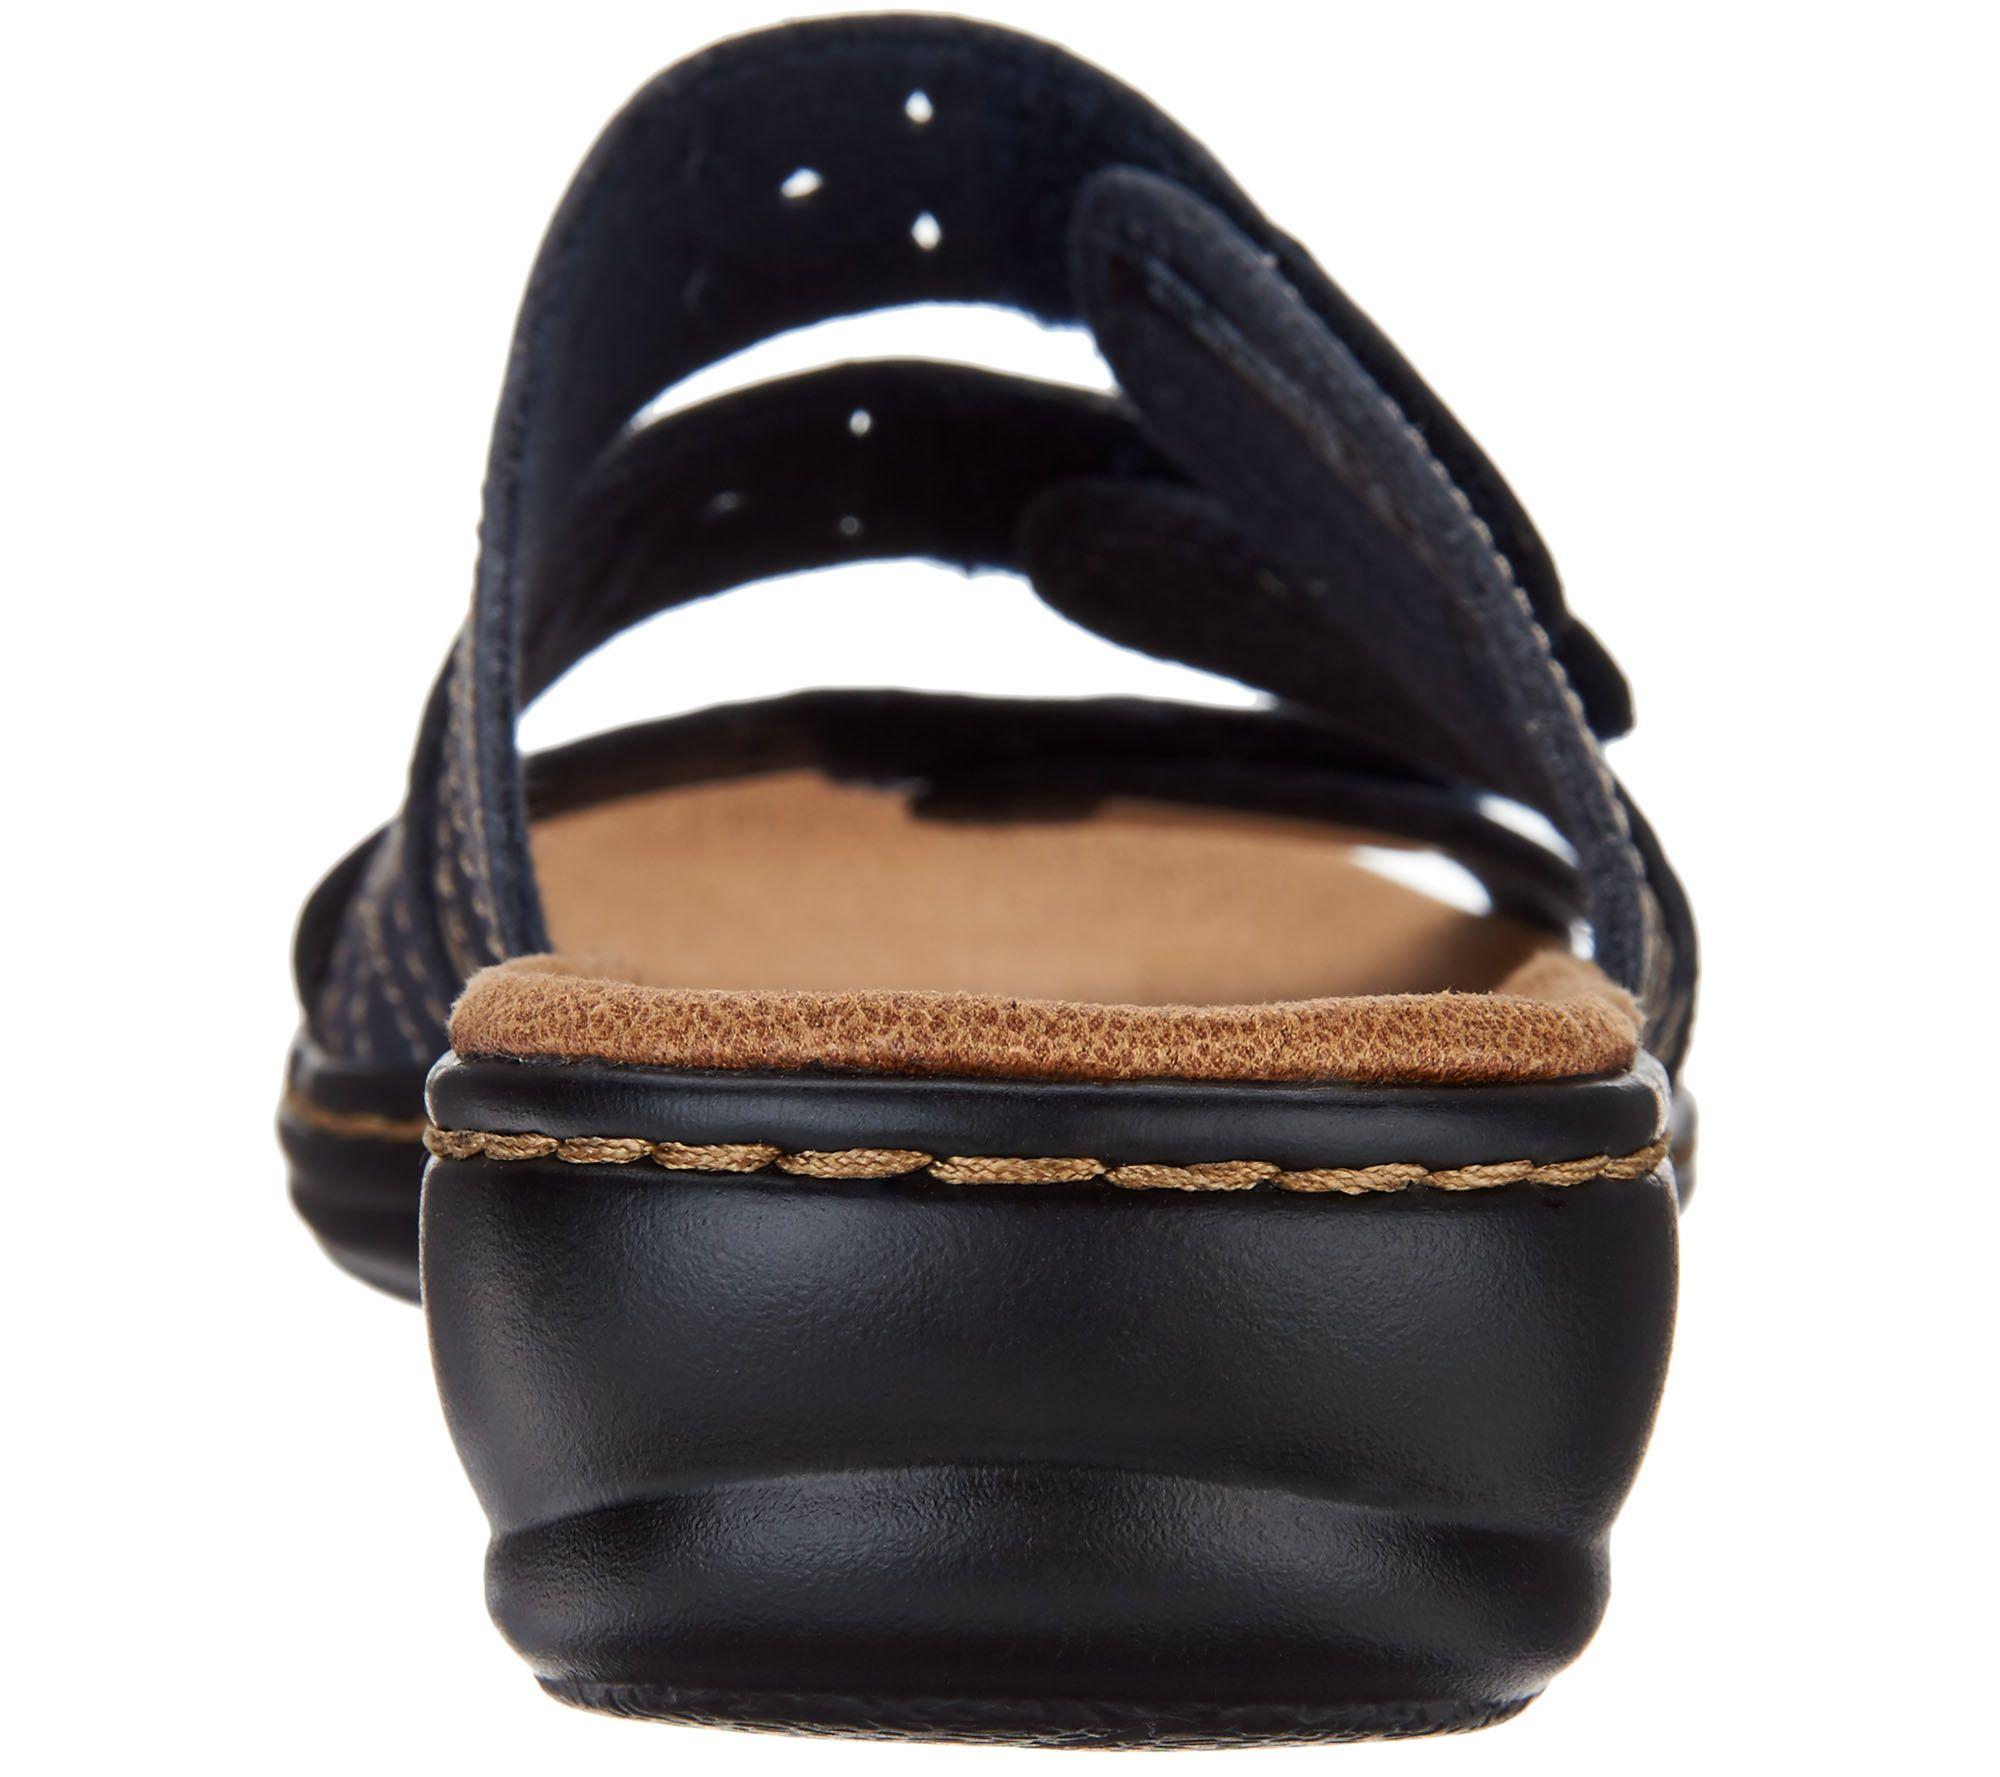 c486cbec67bf6 Clarks Collection Leather - Strap Slides - Leisa Cacti — QVC.com